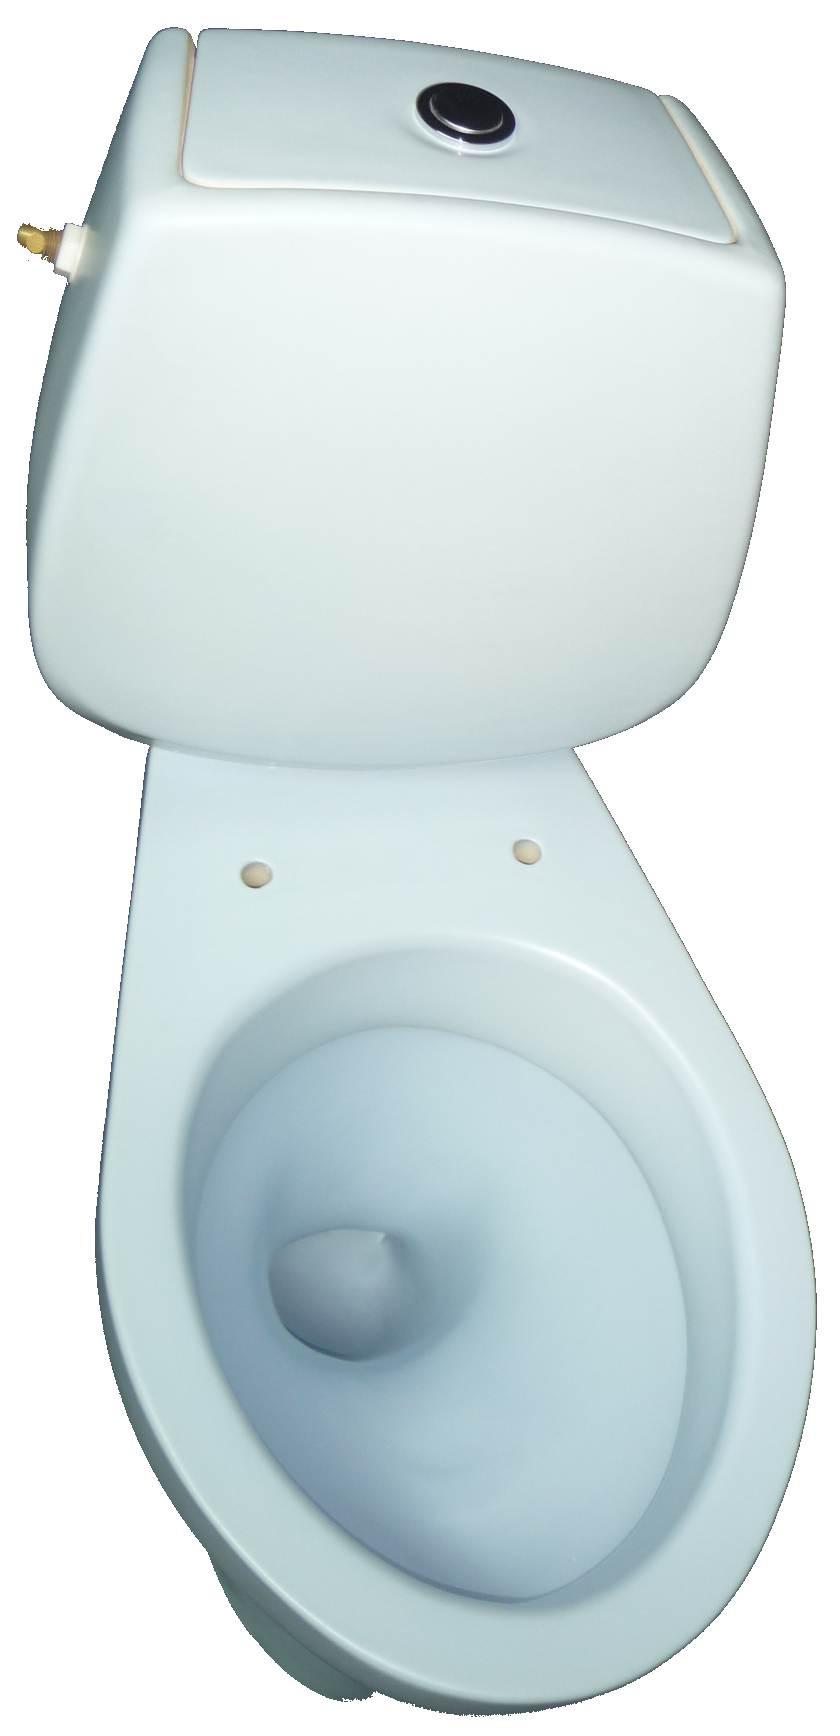 crocus Stand-WC-Kombination Warneton 444 2709 Bild 2